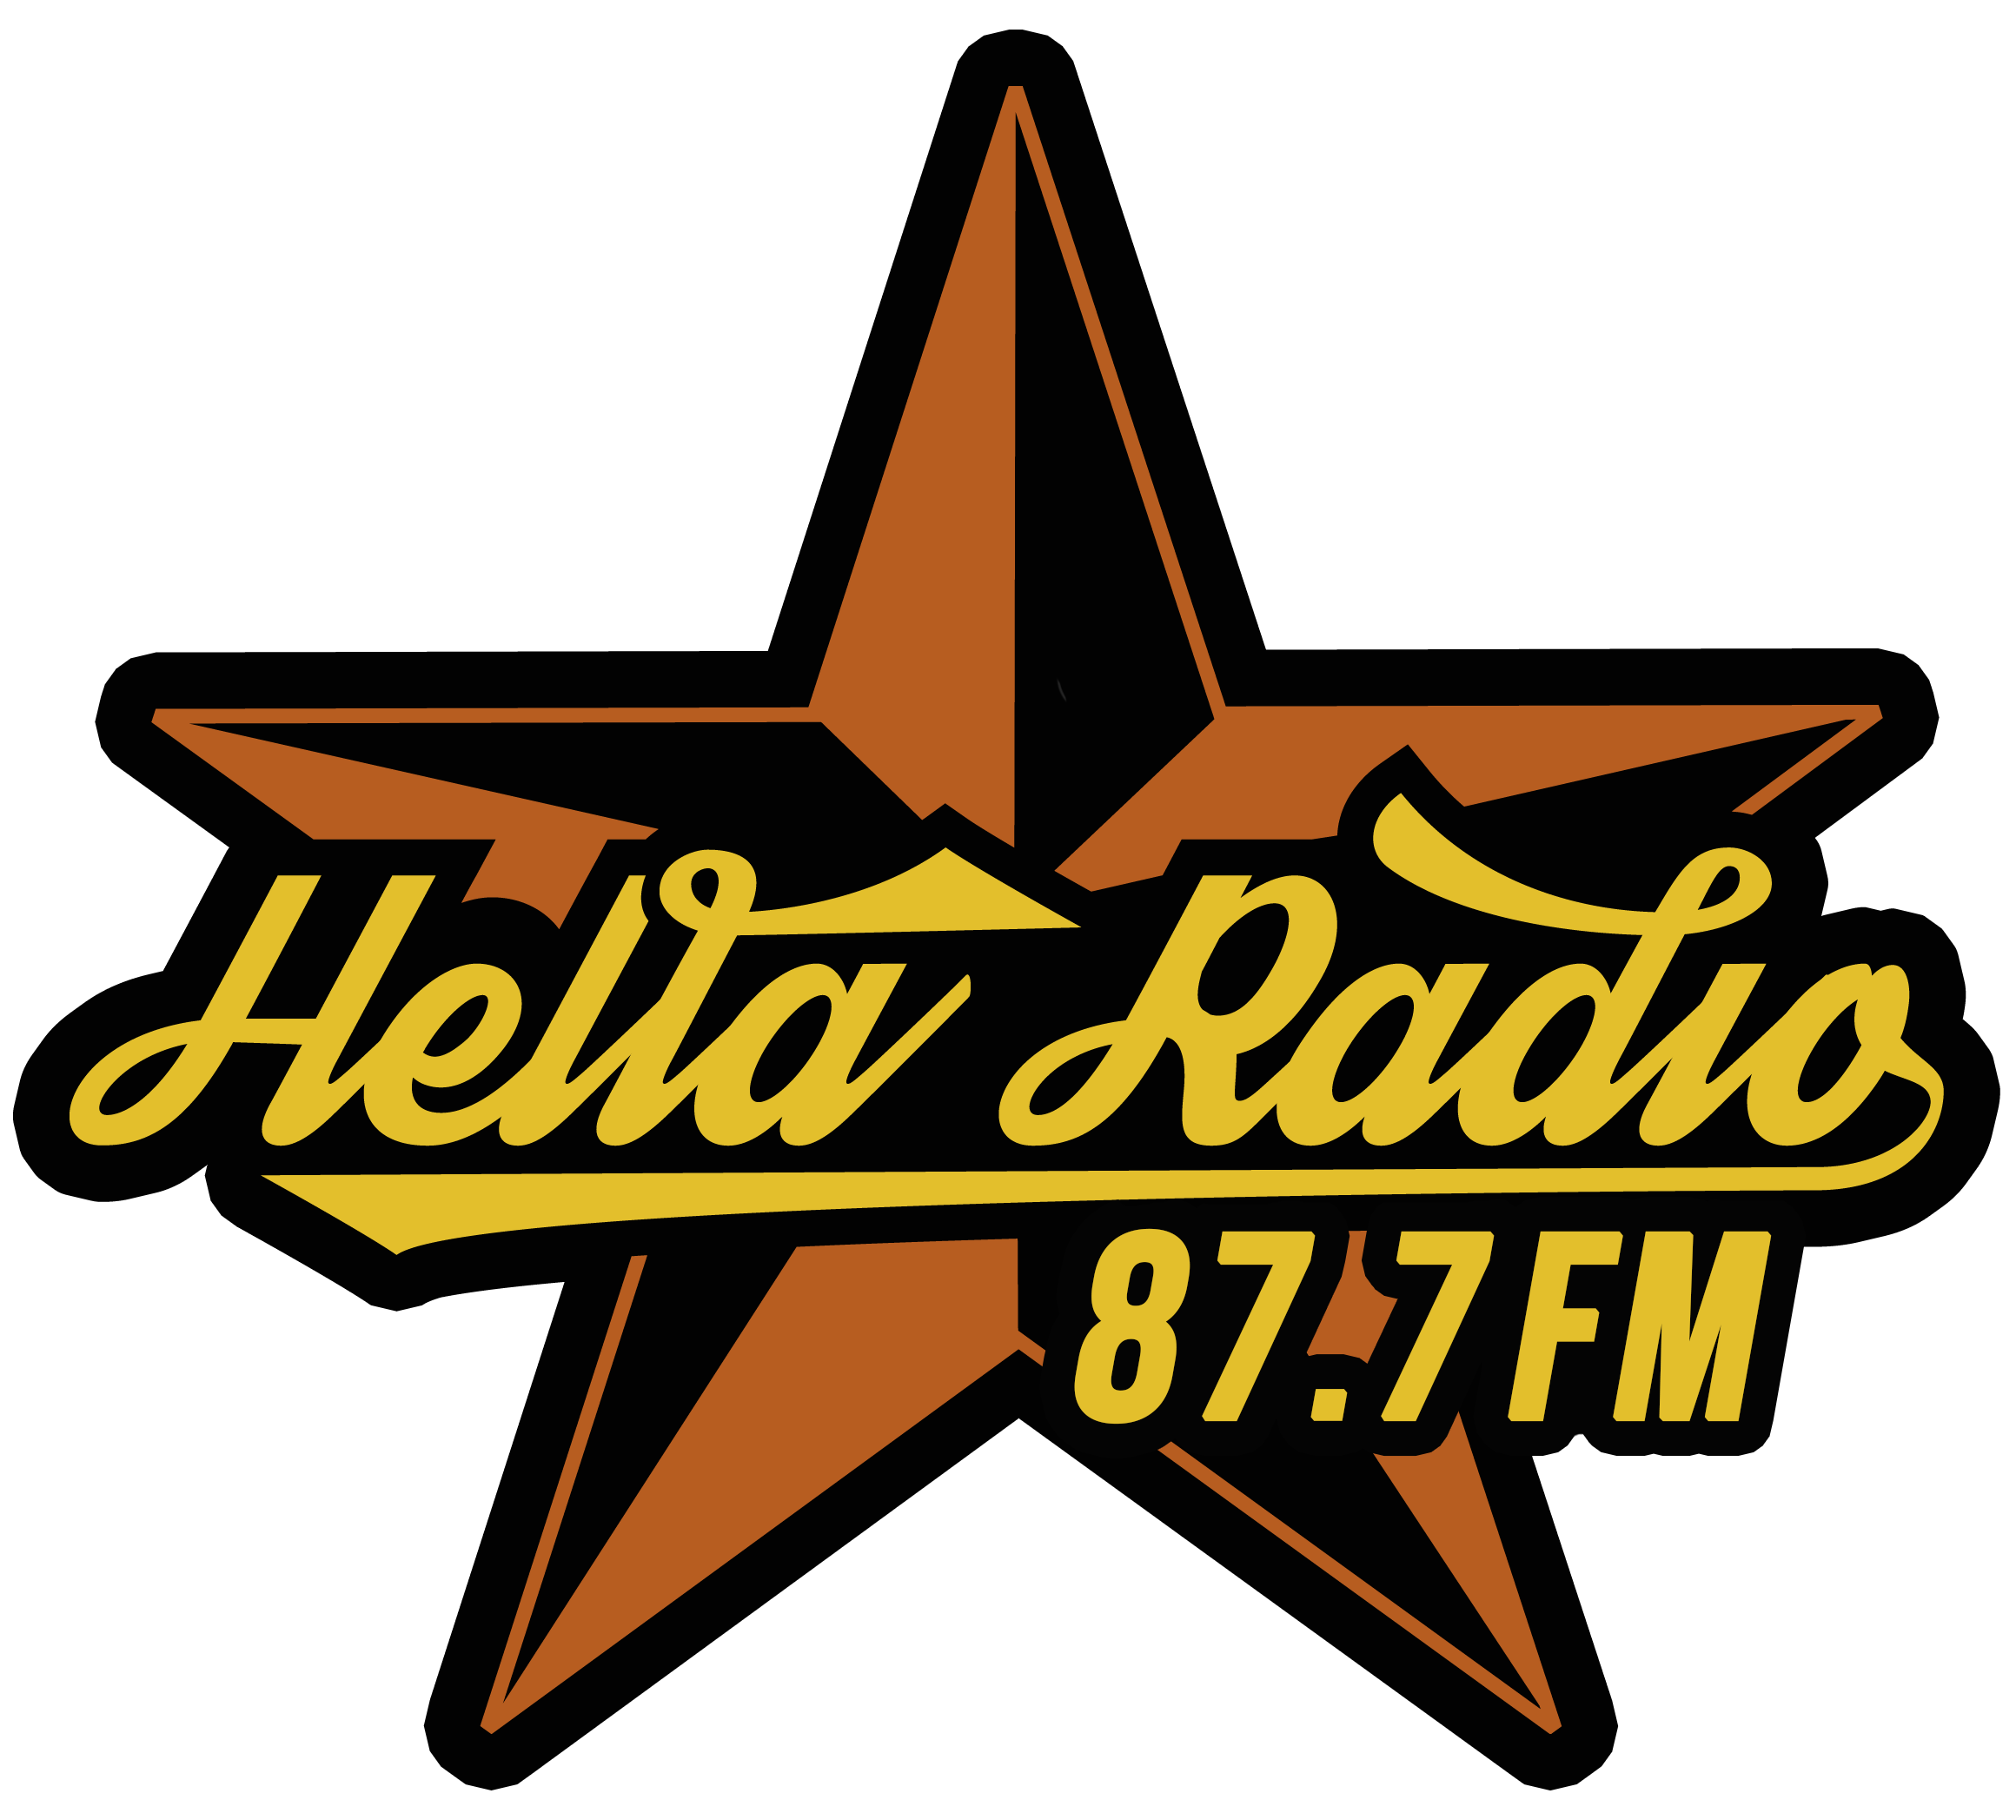 Hella Media Group LLC